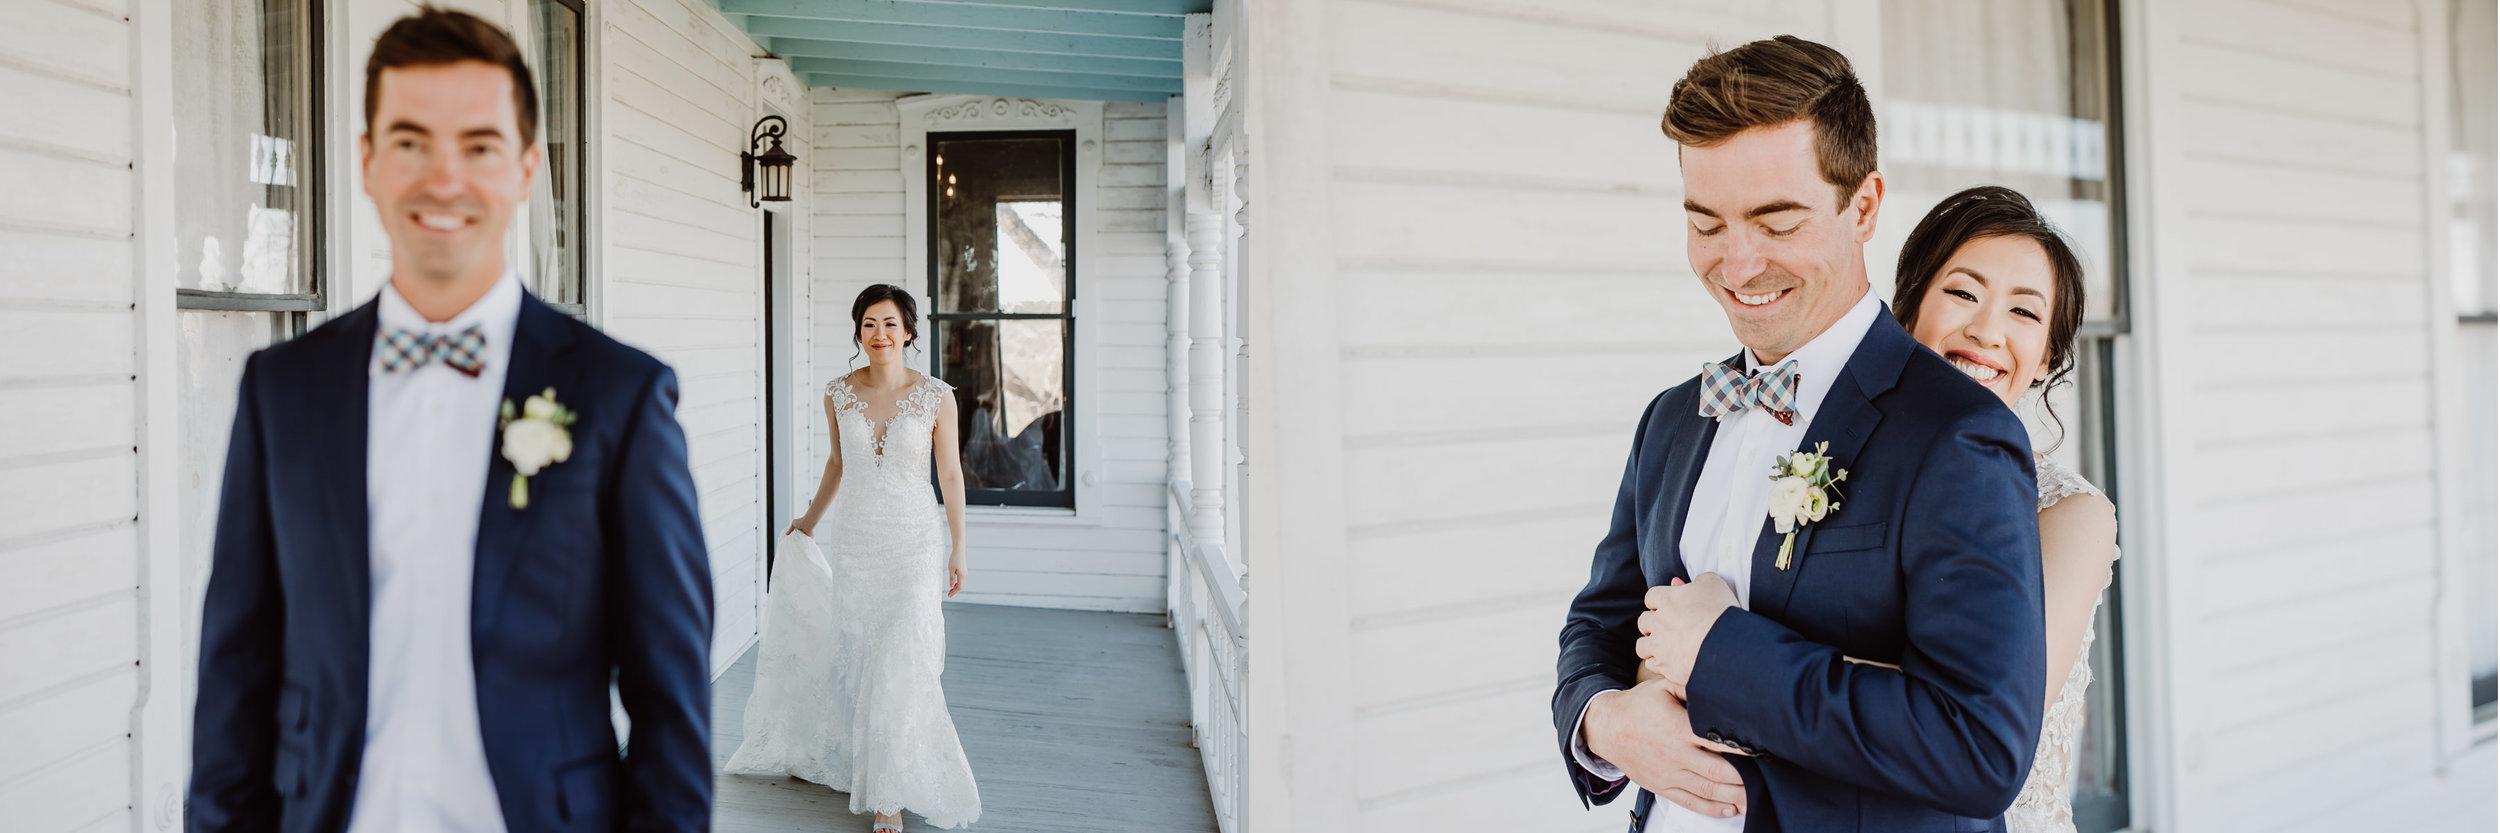 barr-mansion-wedding-9.1.jpg